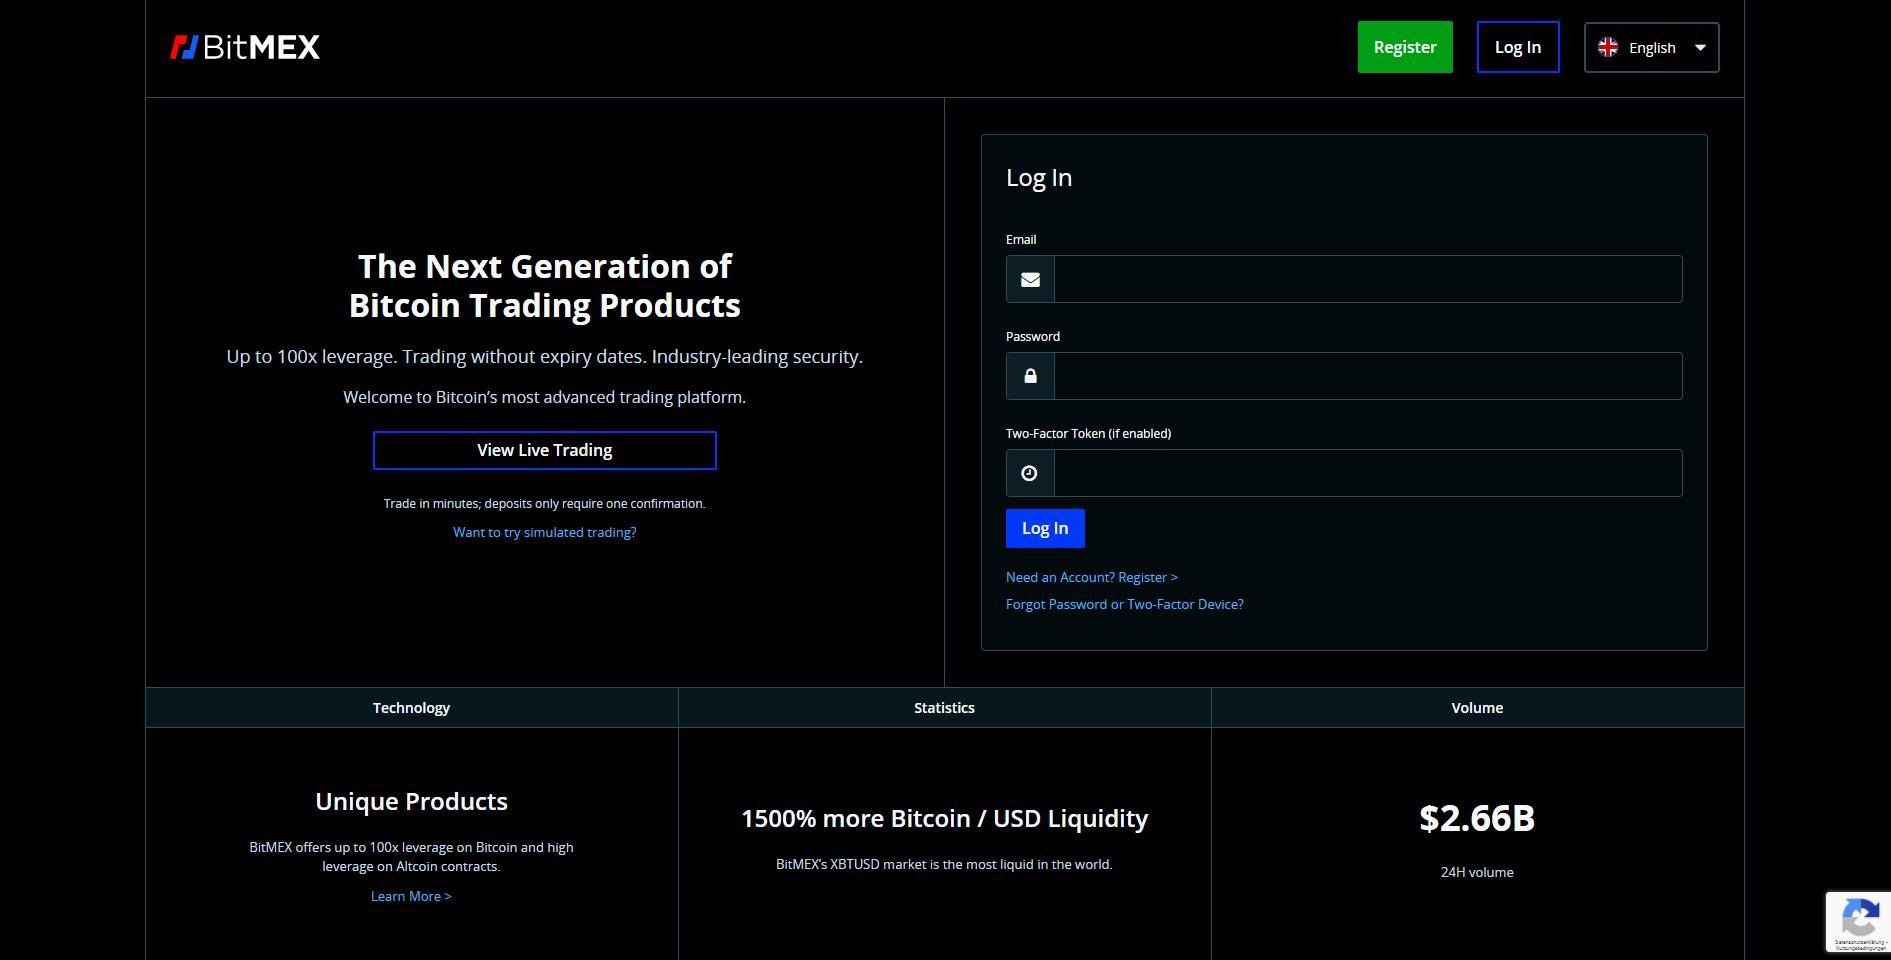 Official website of BitMEX